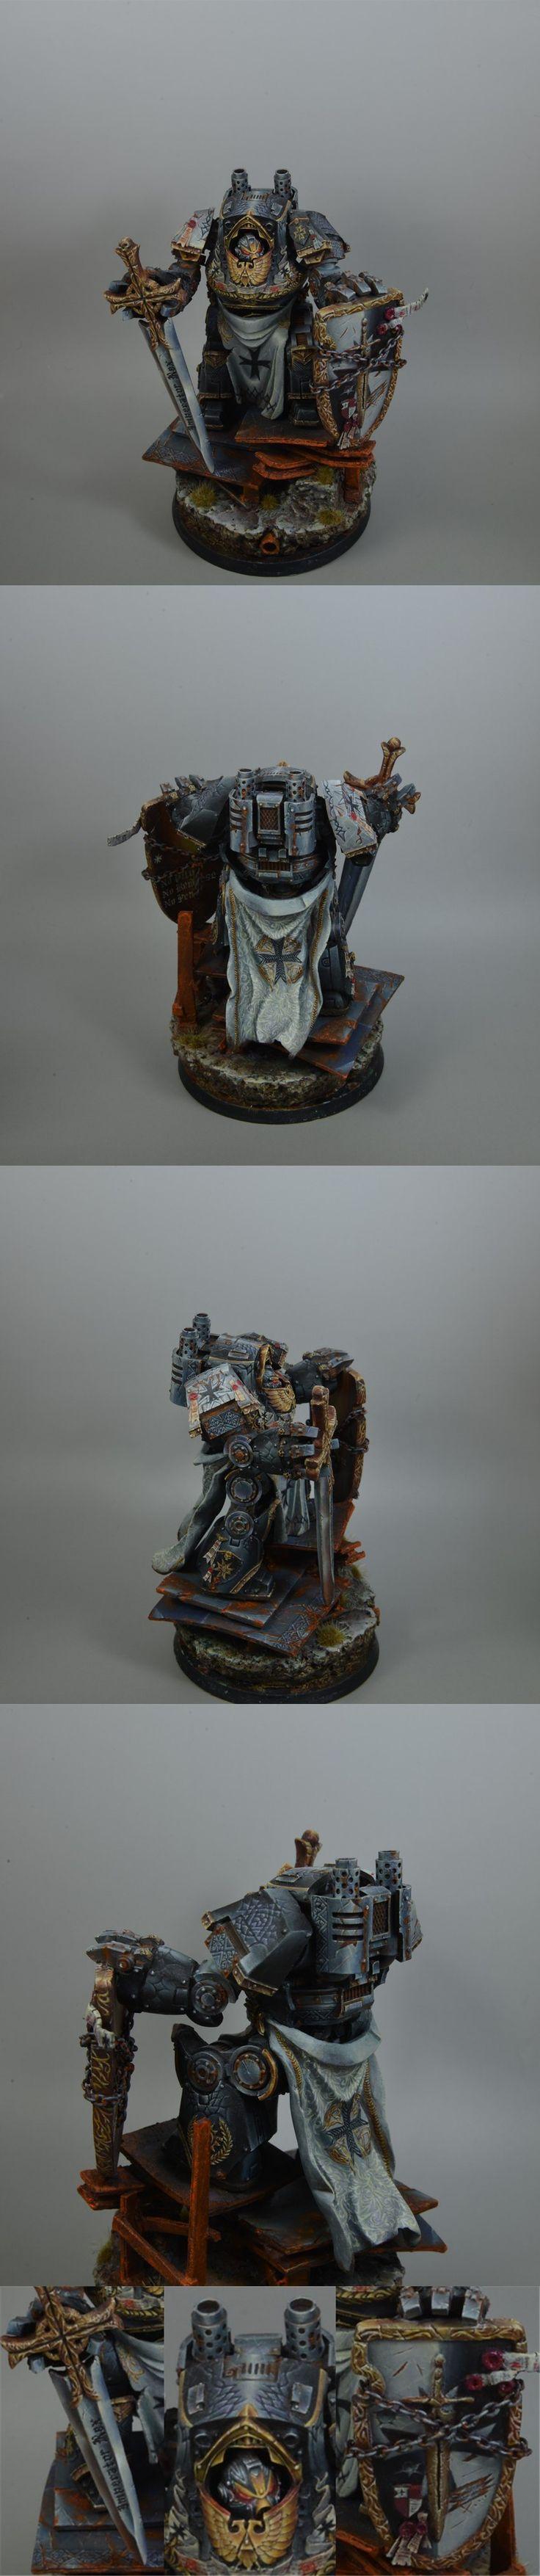 Black Templar Dreadnought by bb68922449